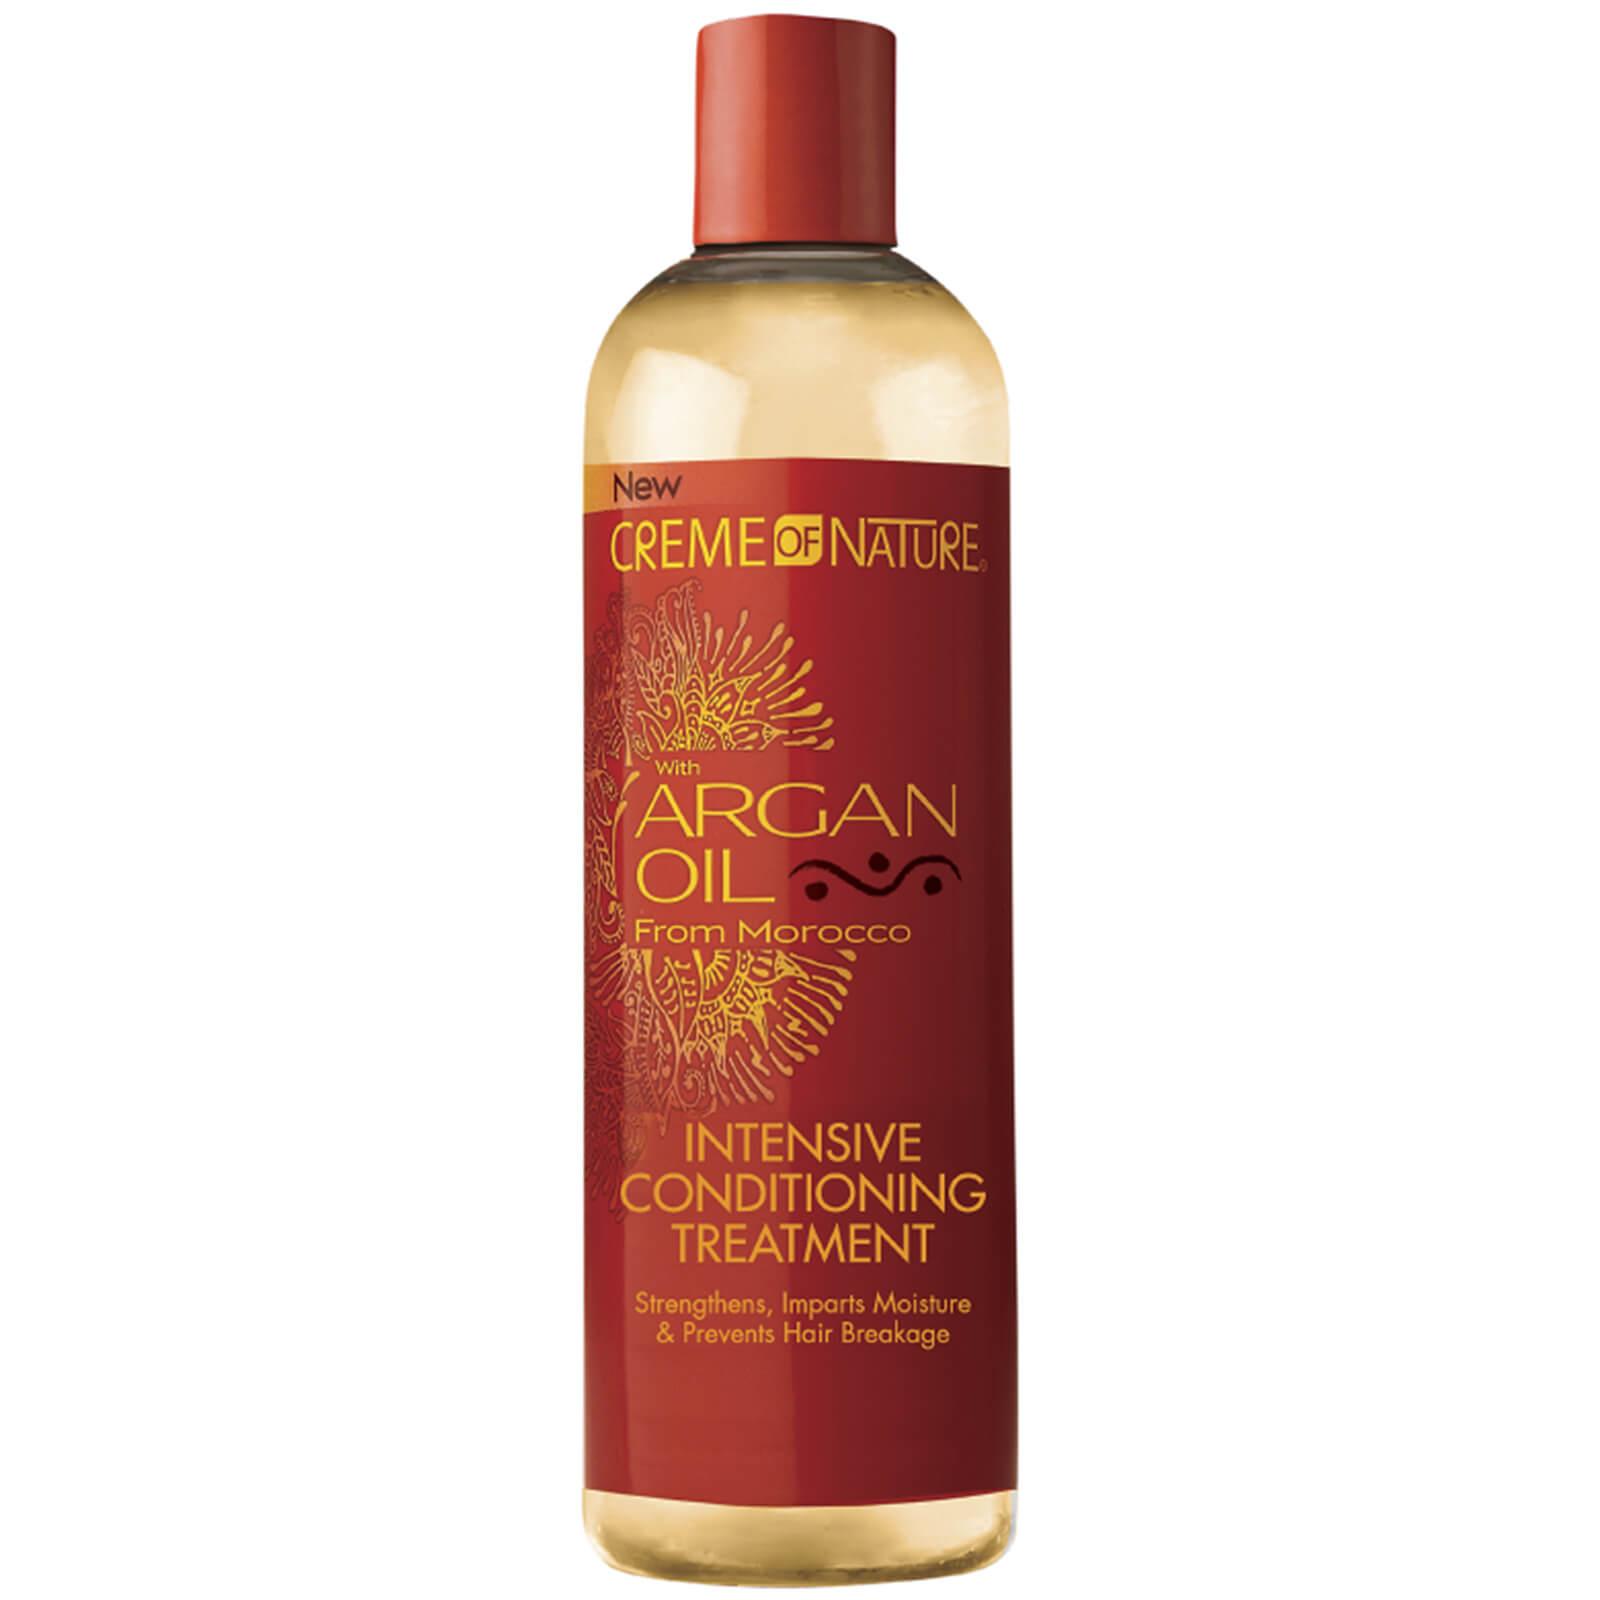 Купить Crème of Nature Argan Oil Intensive Conditioning Treatment 354ml